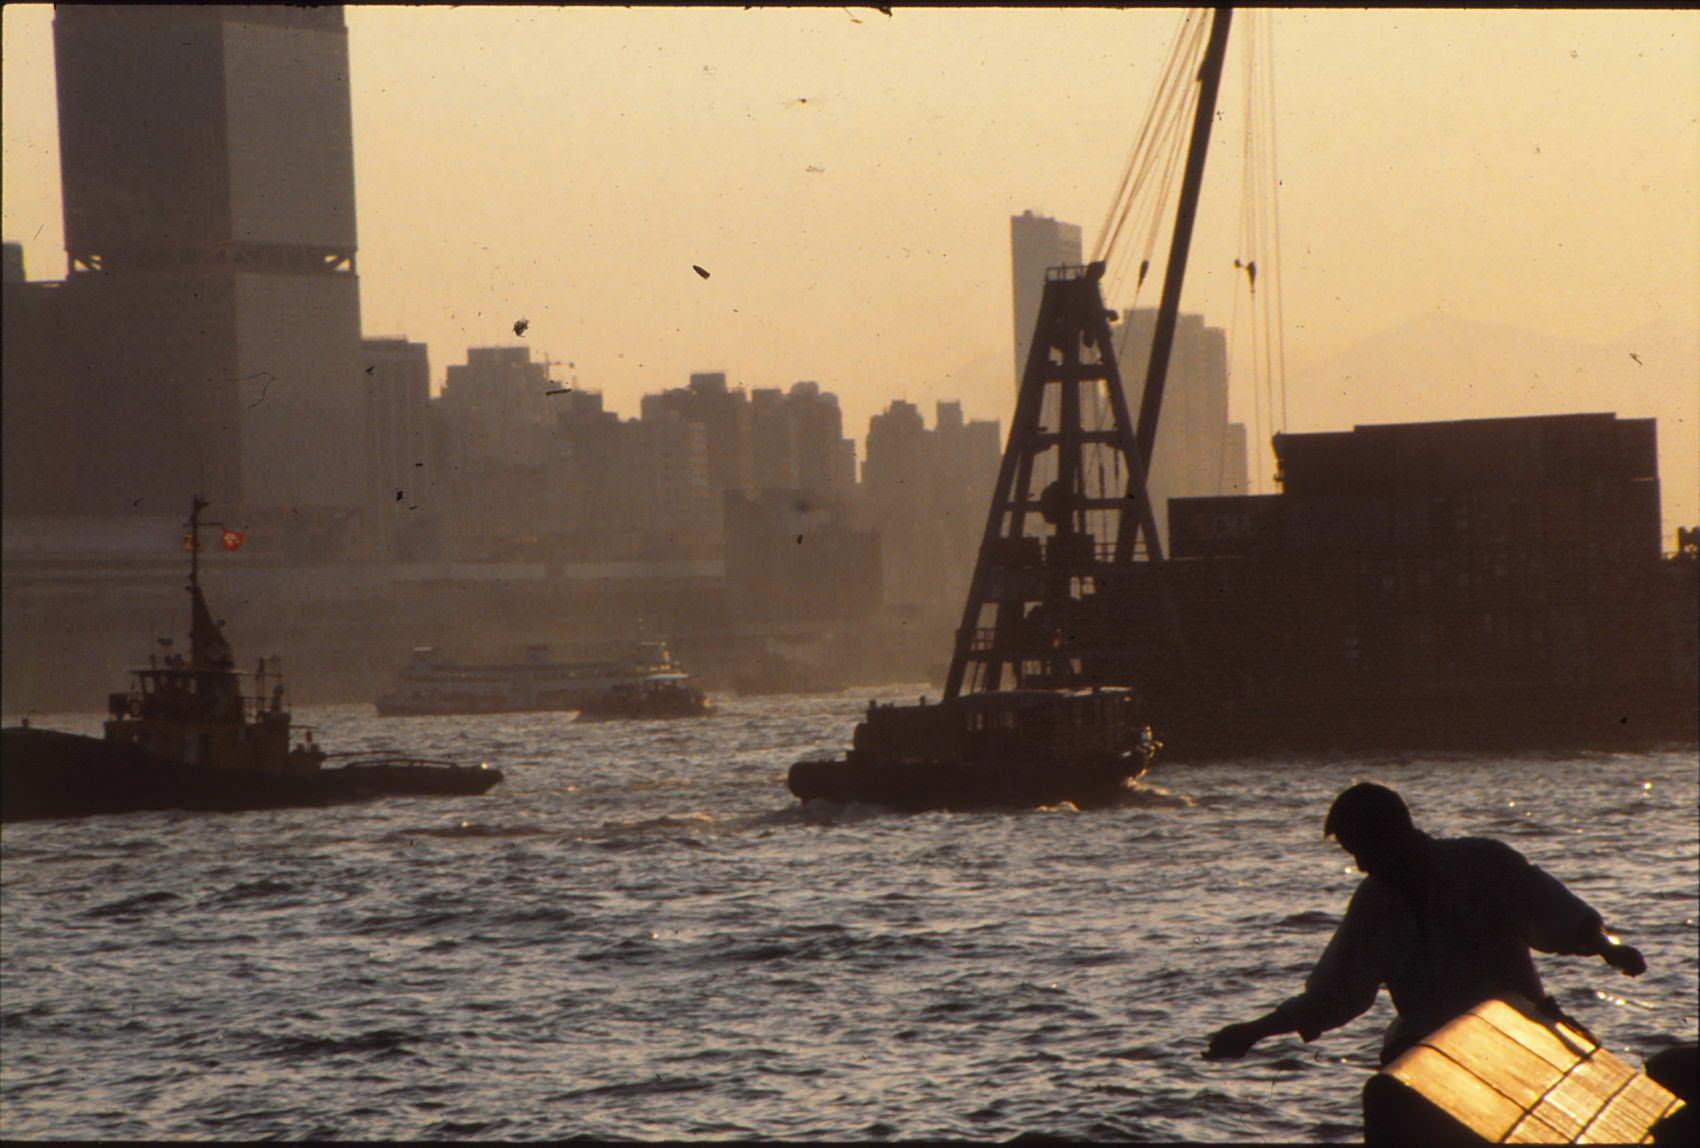 Hong Kong as a Model for a Free Society